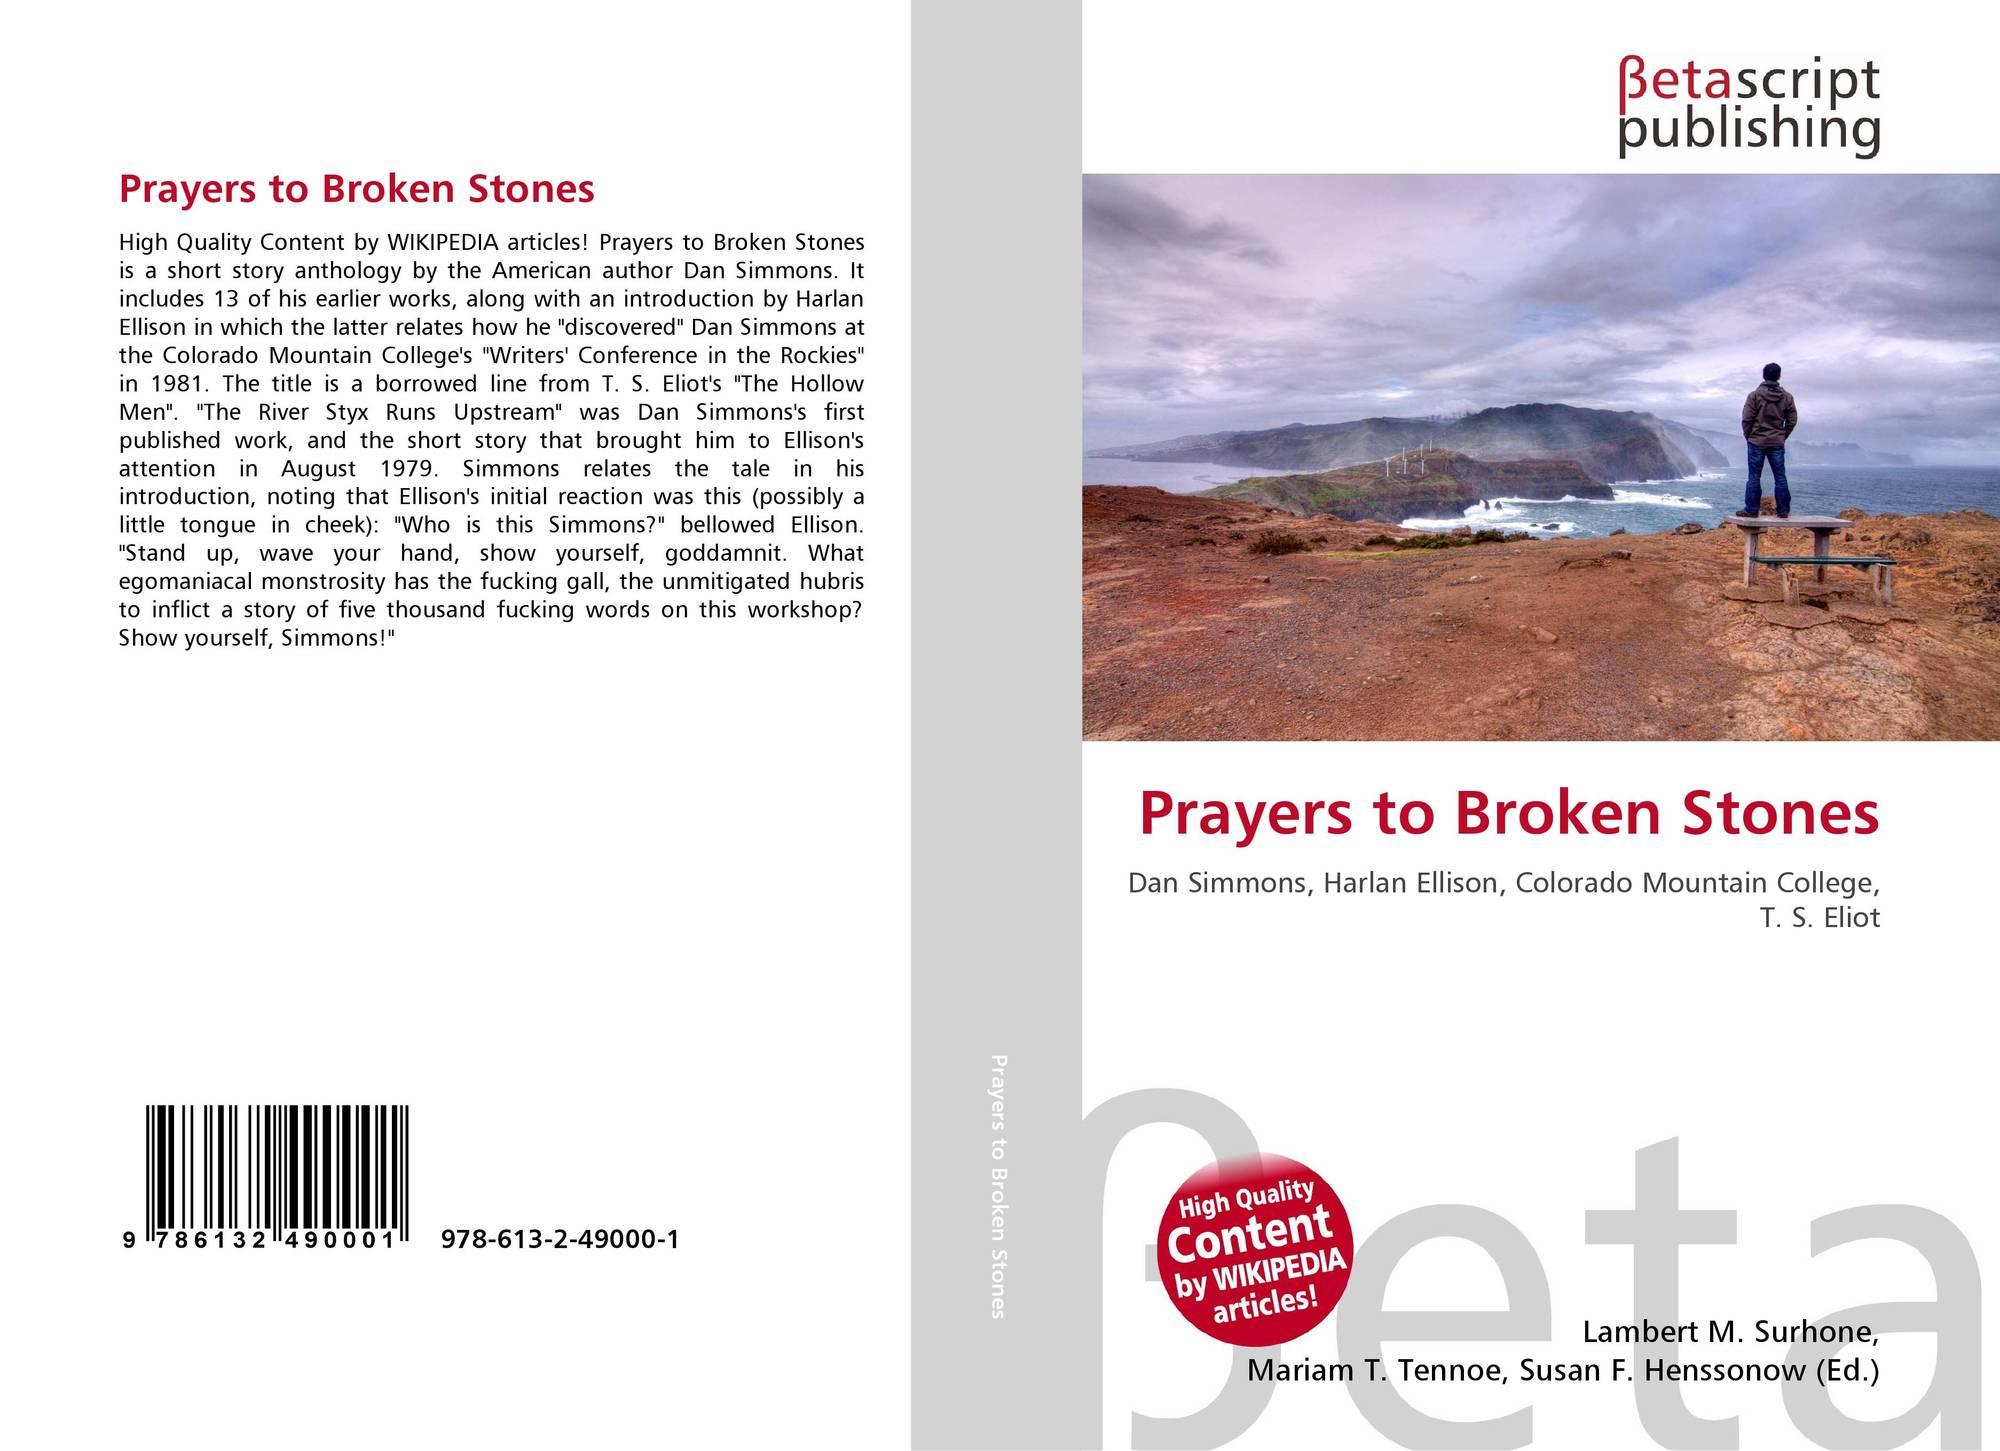 Prayers to Broken Stones, 978-613-2-49000-1, 6132490000